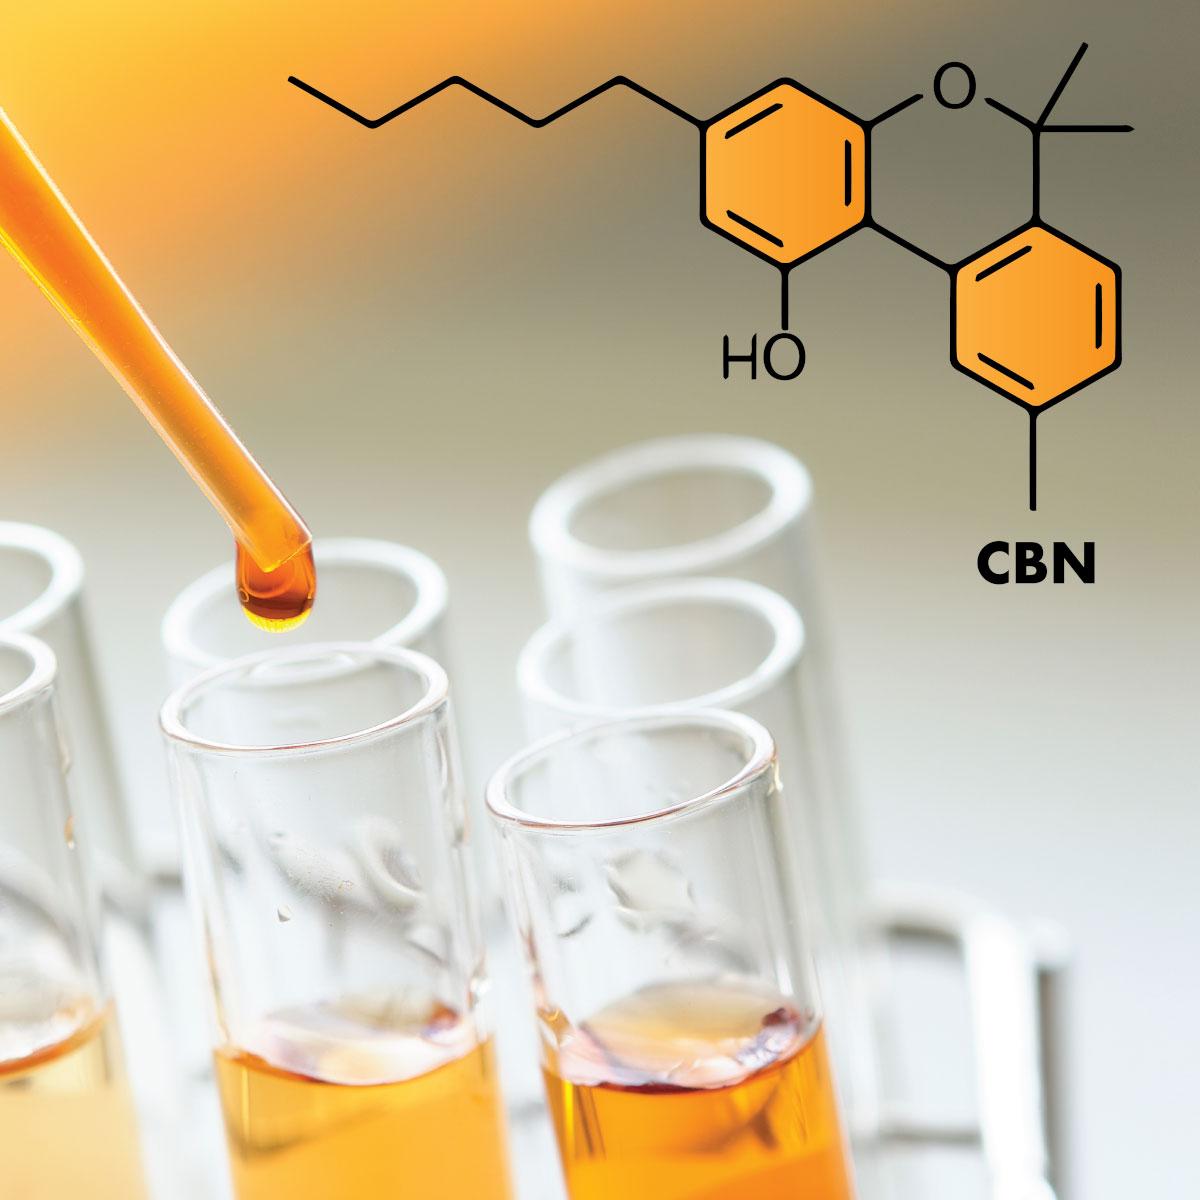 CBD wellness, broad spectrum hemp extract, cbd for sleep, cbn